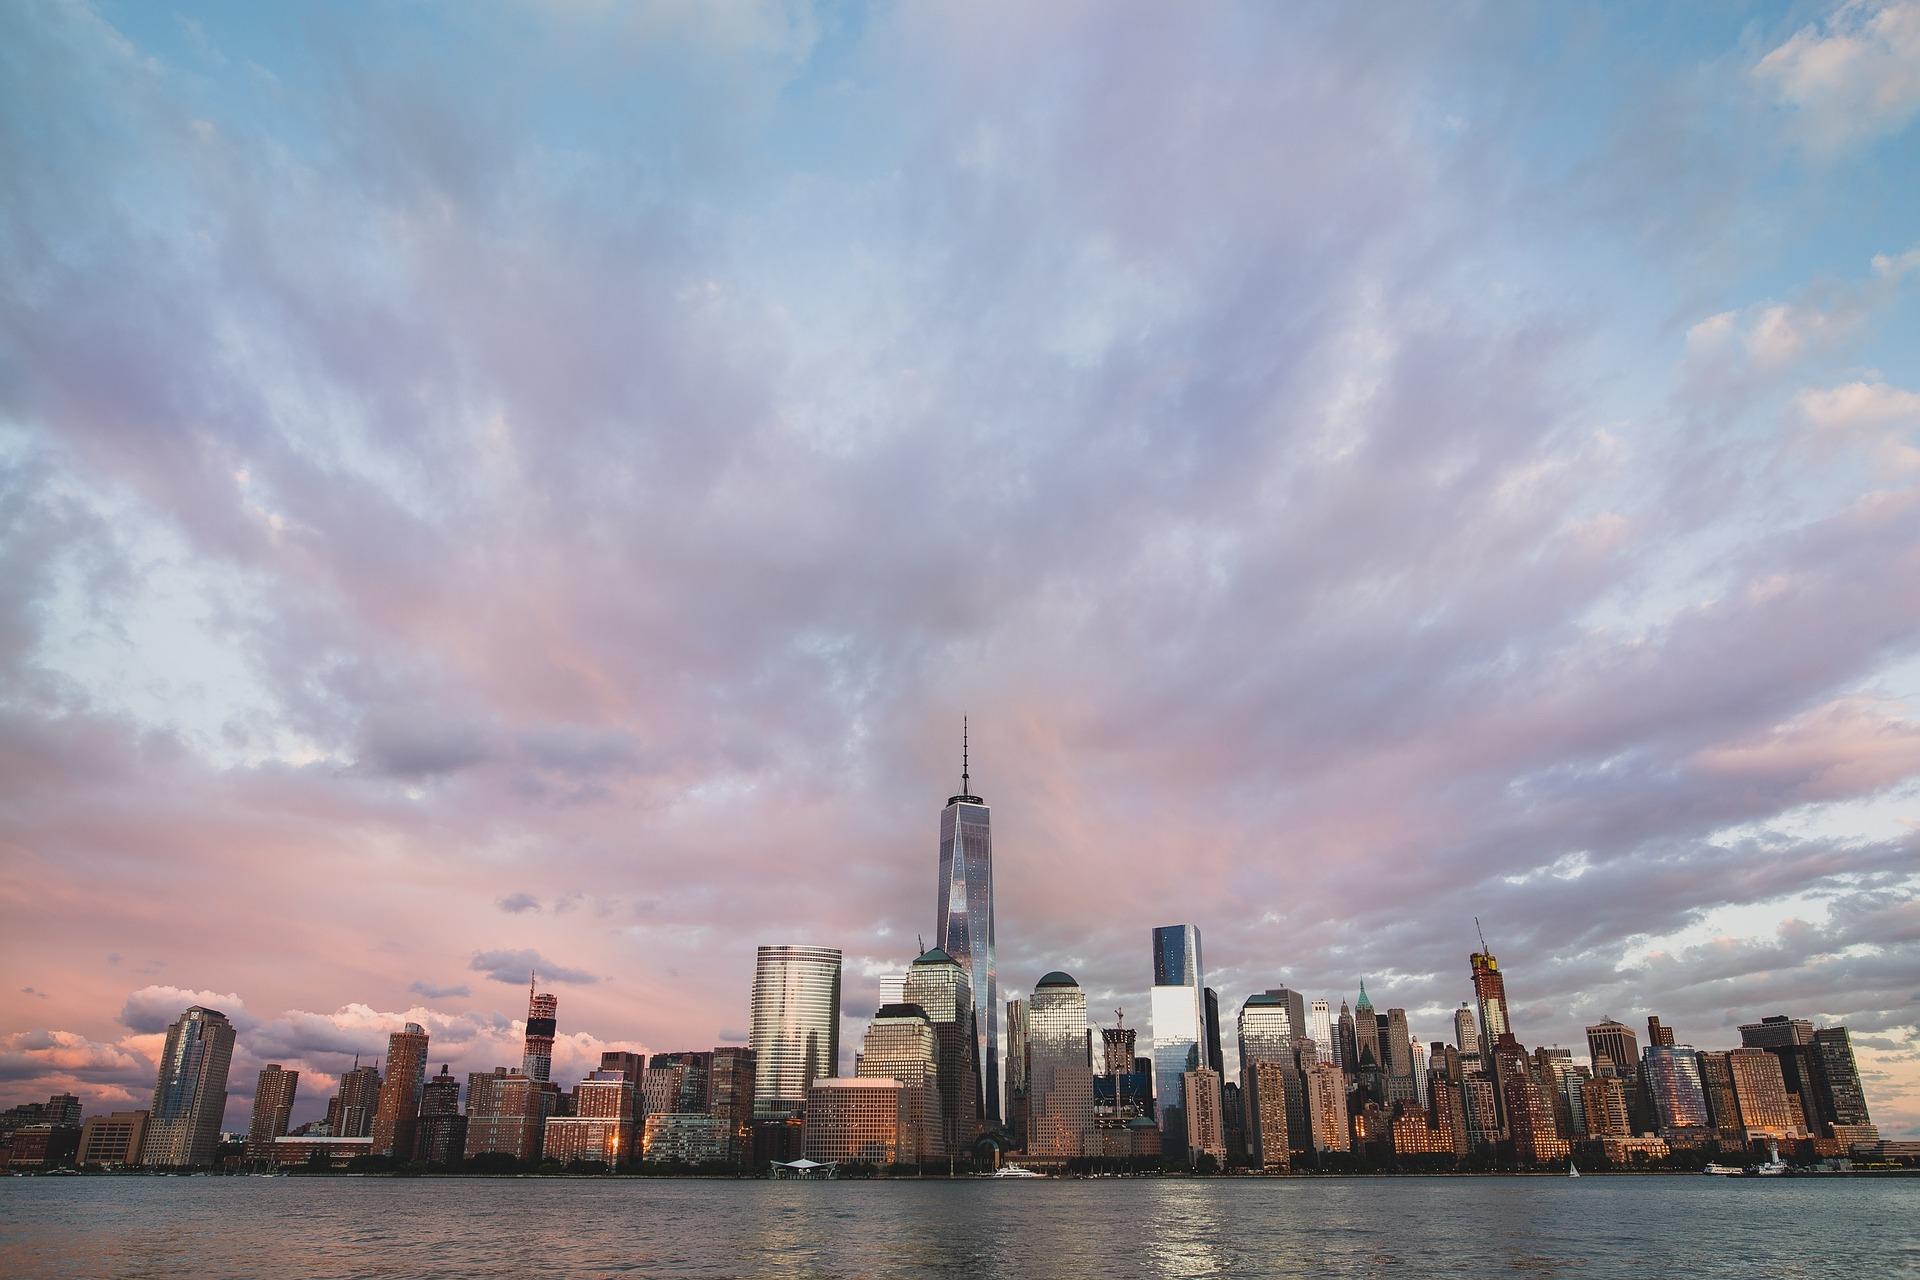 new-york-city-984316_1920.jpg